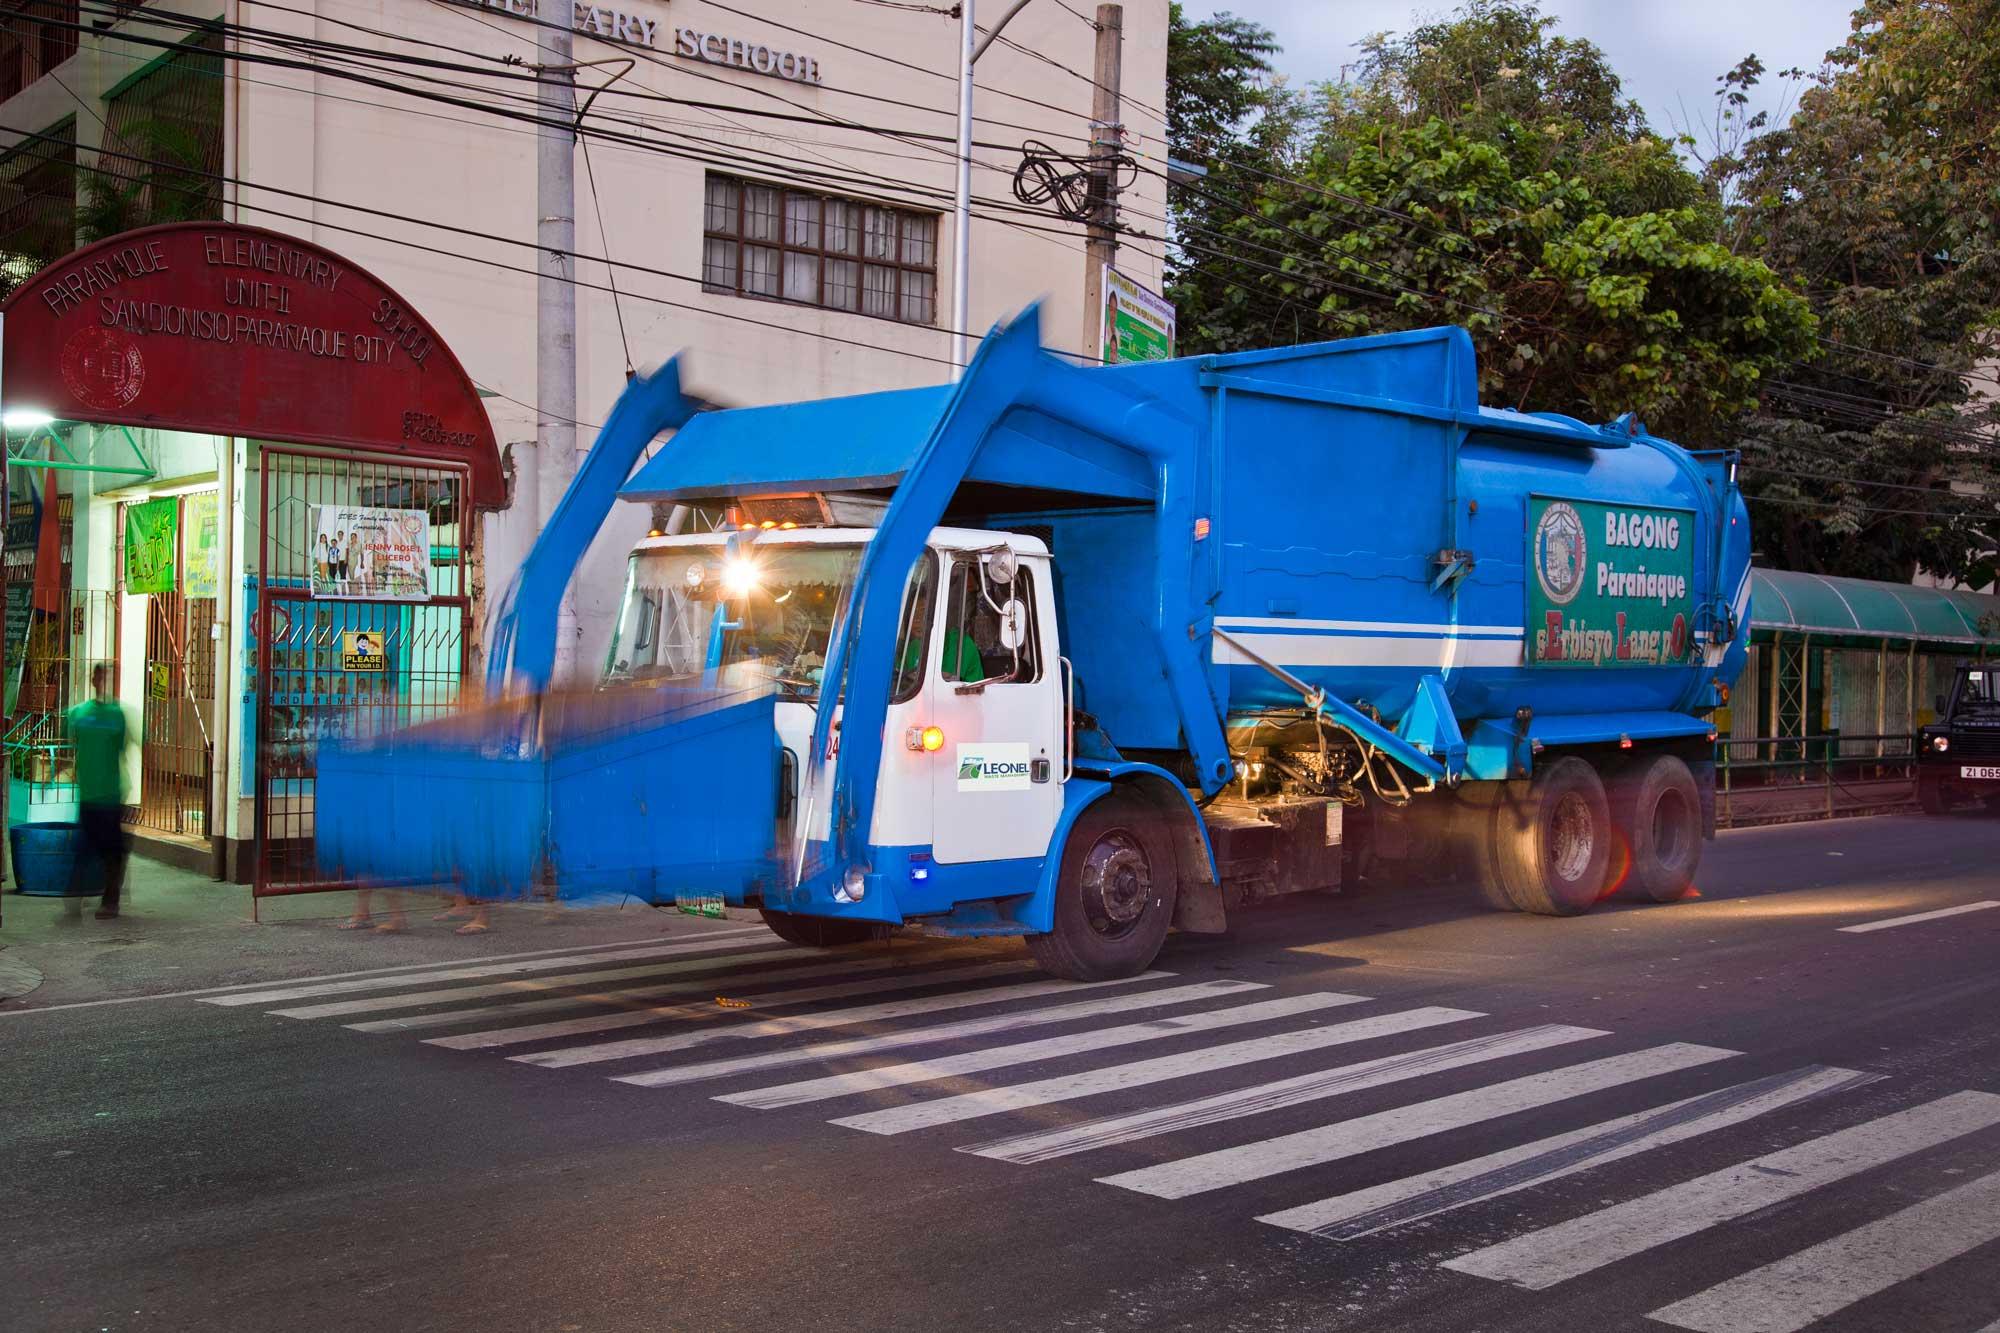 Leonel Waste Management